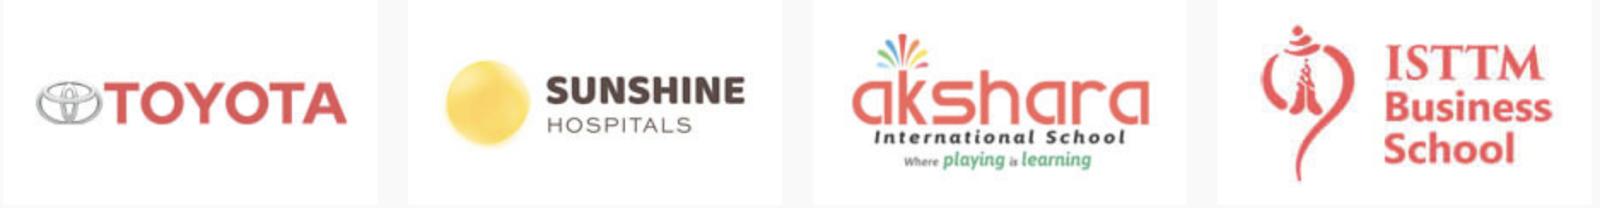 ITinfo Digital Clients - Digital Marketing Agencies in Hyderabad